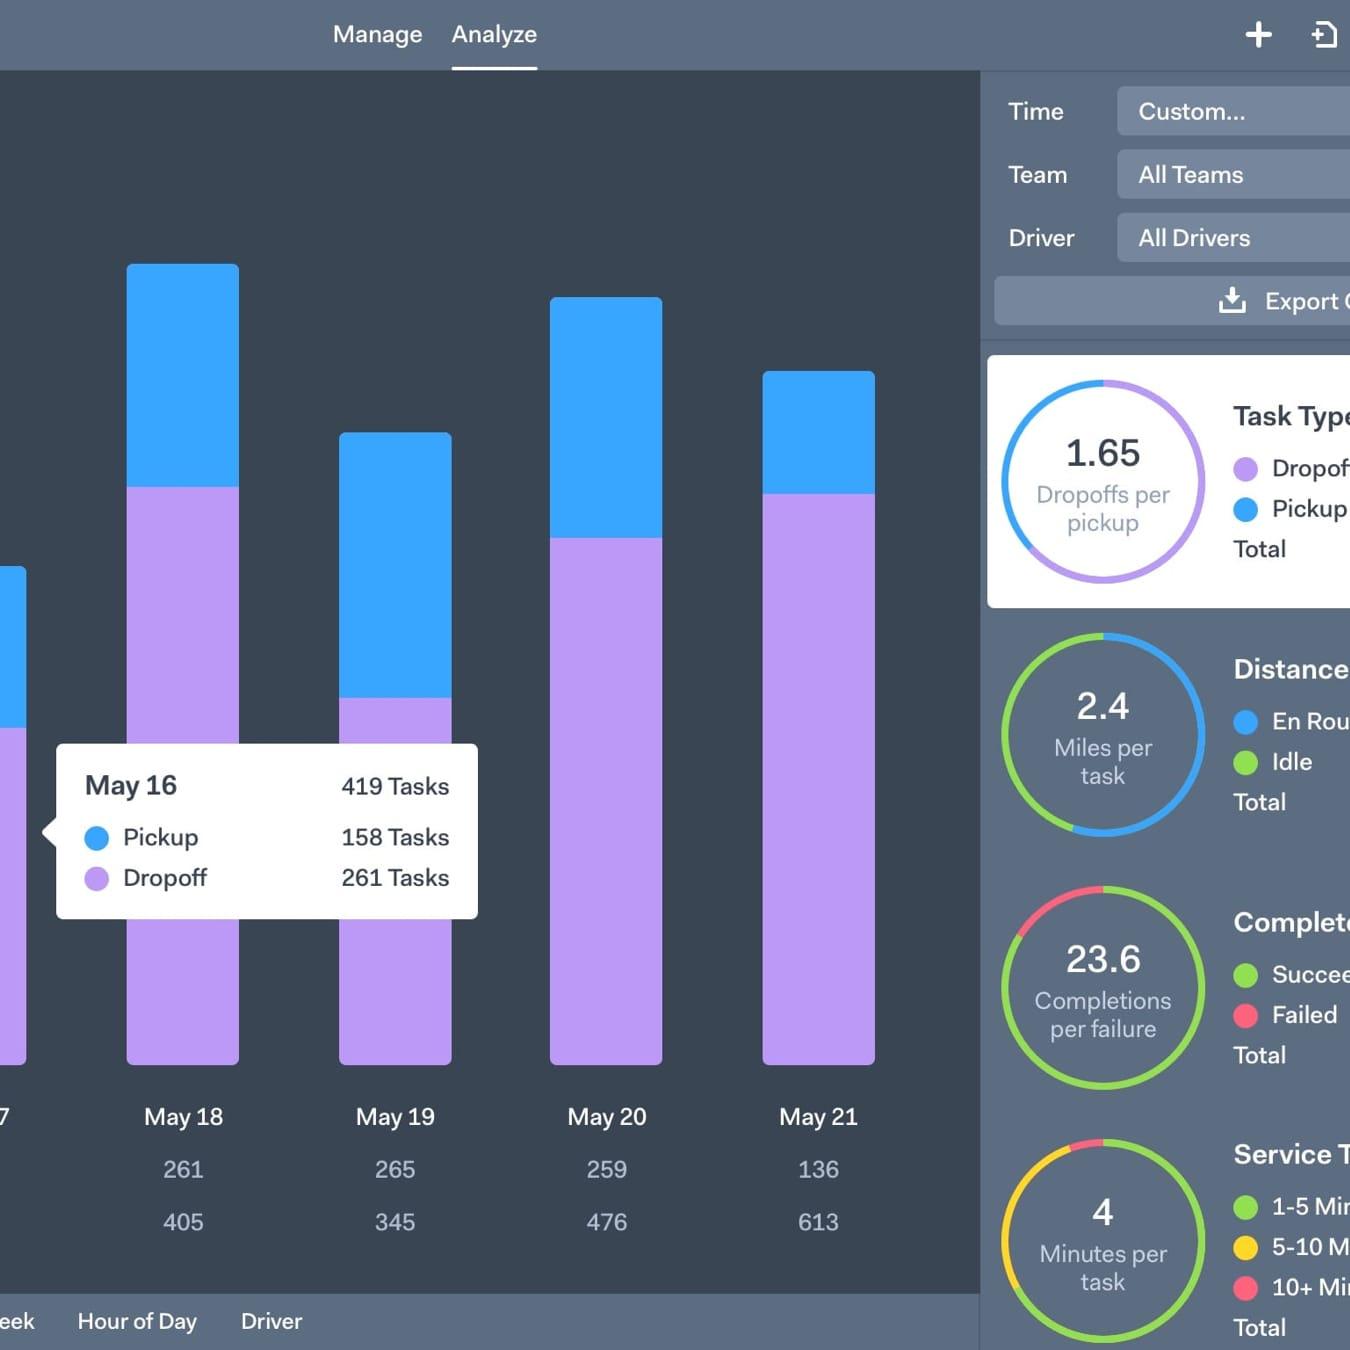 Analyze & Export Data